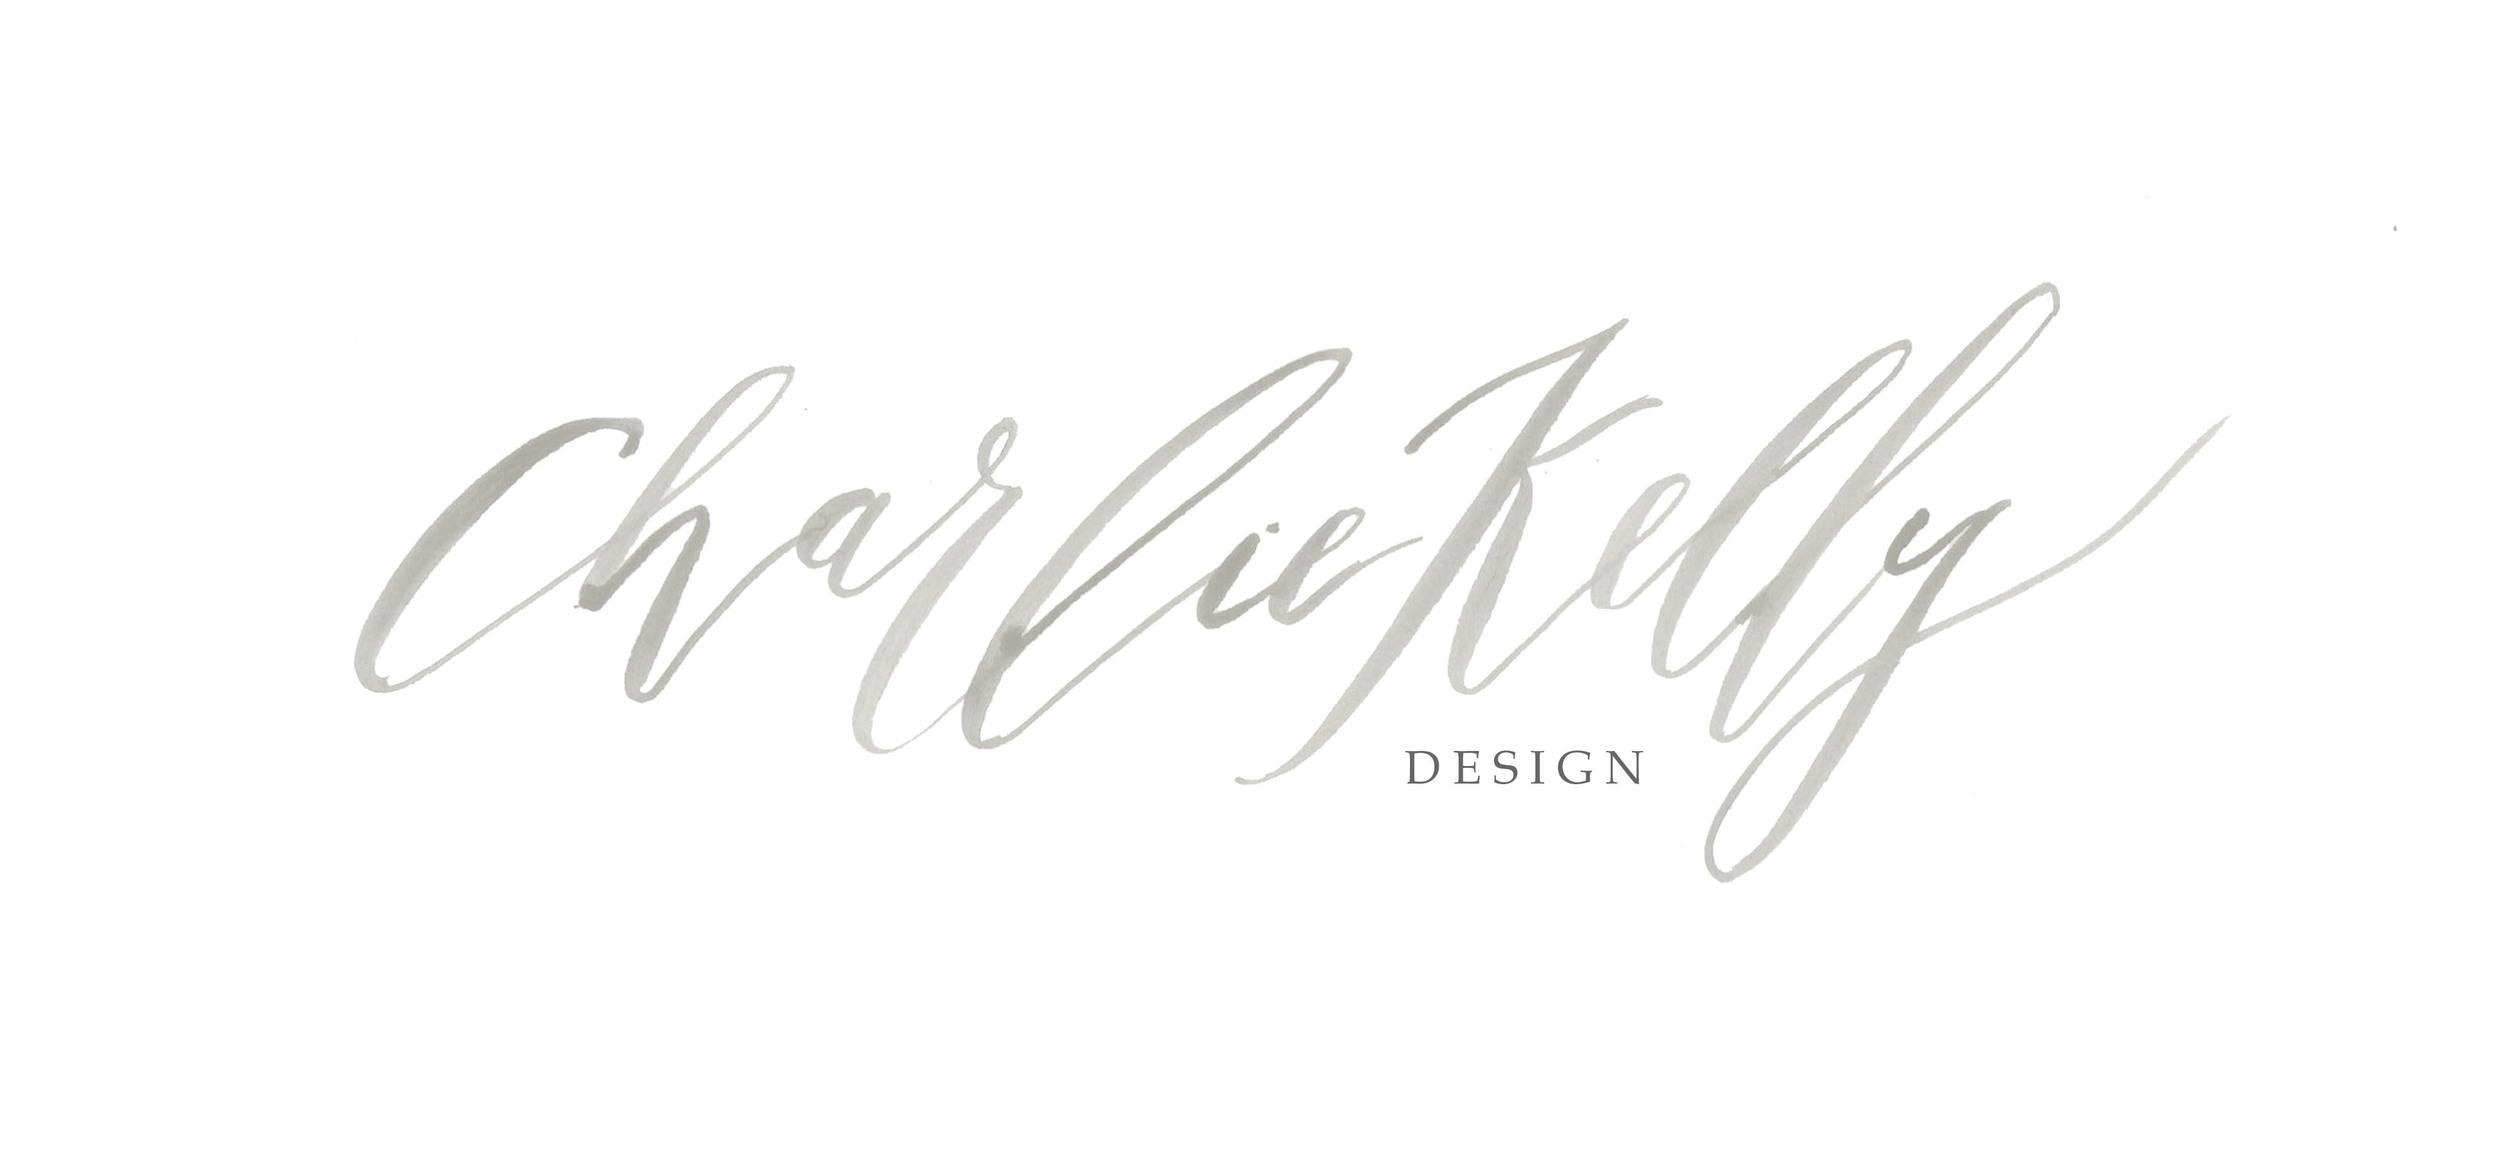 Tier III Calligraphy Watercolor Logo Submark Monogram